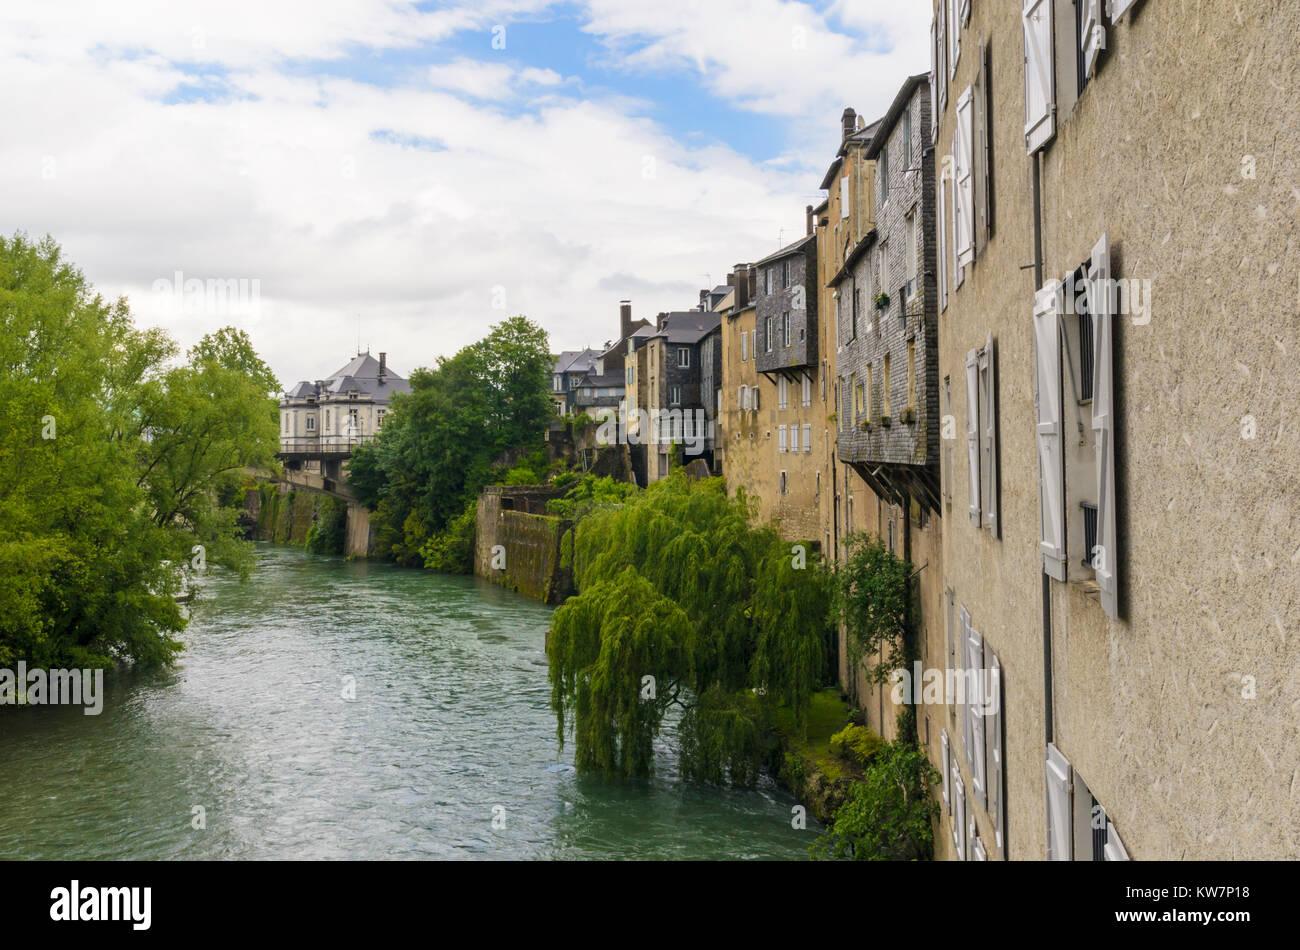 Case Sospese lungo il fiume Gave d' Aspe, Oloron-Sainte-Marie, Pyrenees-Atlantiques, Nouvelle-Aquitaine, Francia Immagini Stock